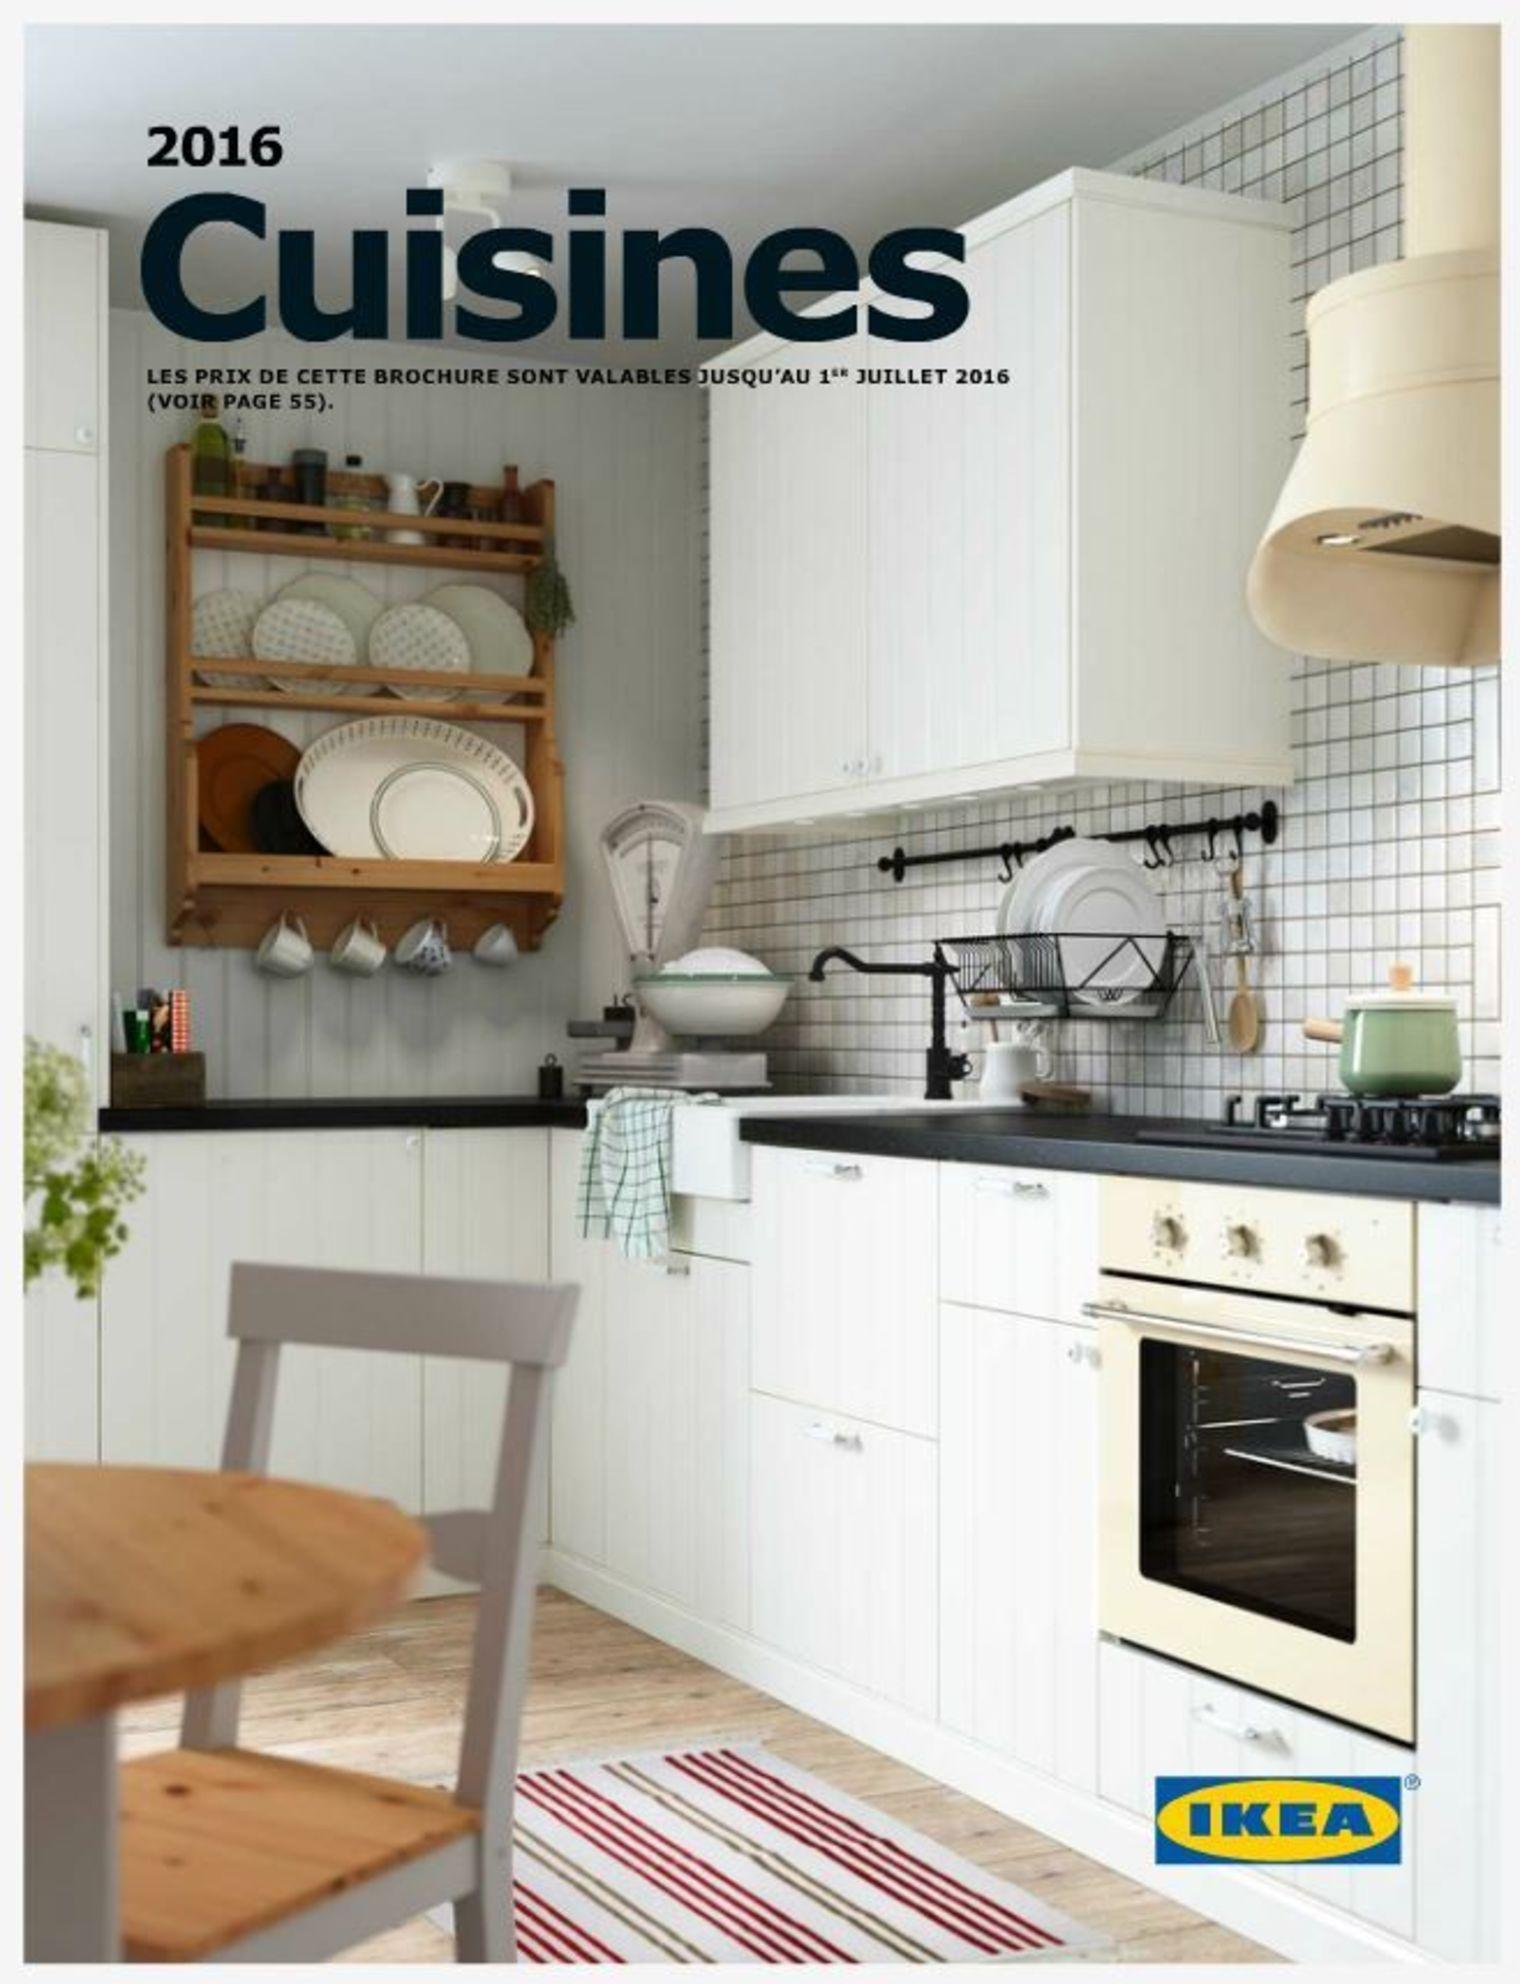 Cuisine Ikea Consultez Le Catalogue Cuisine Ikea Cuisine Ikea Ikea Meuble De Cuisine Ikea